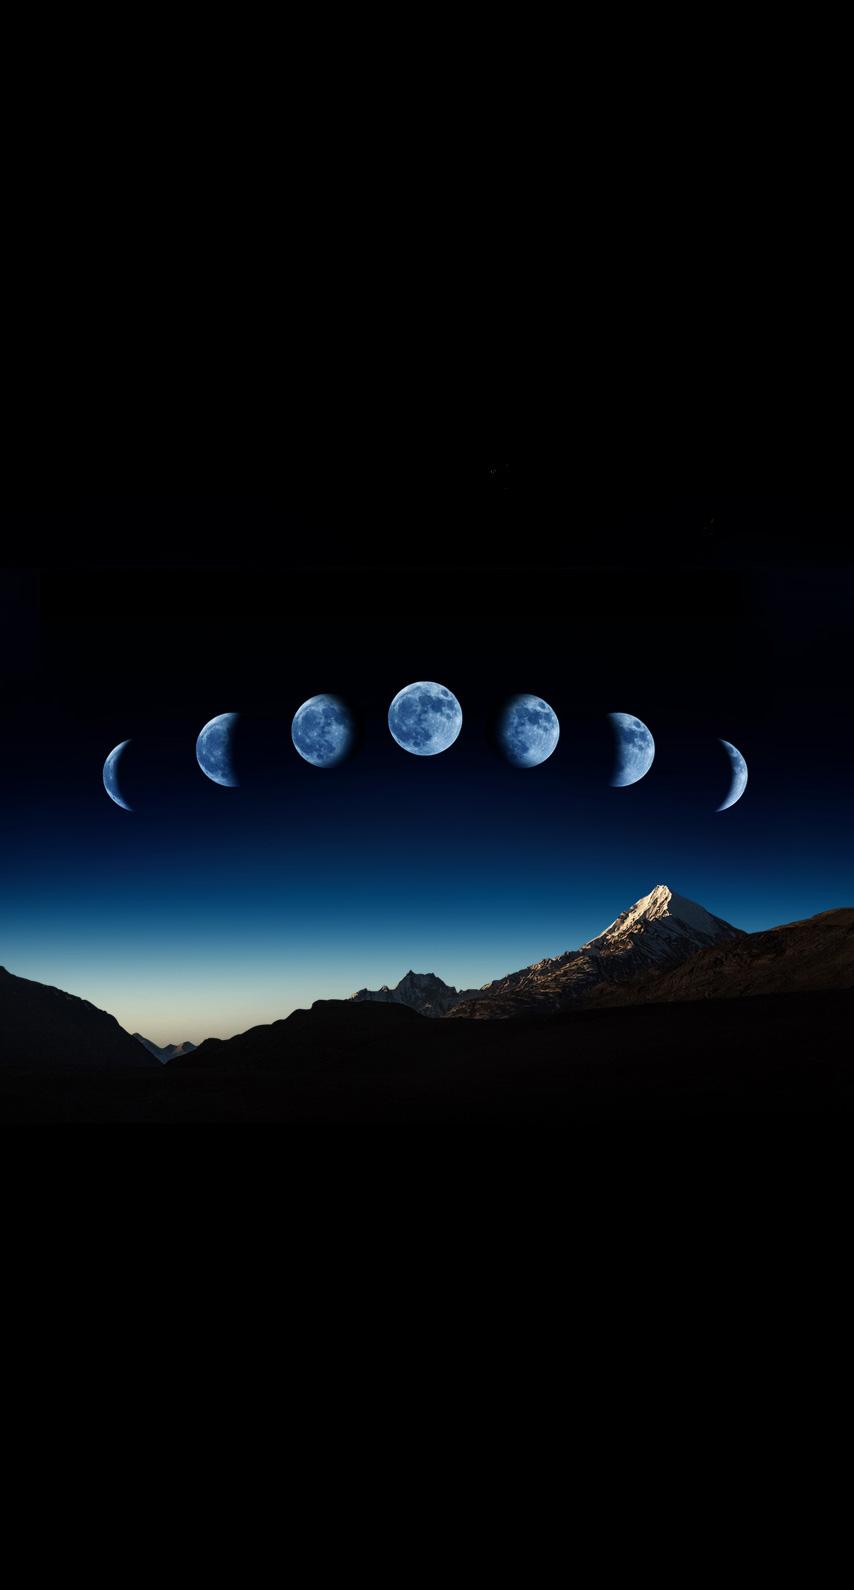 sky, dark, moon, sunset, light, bright